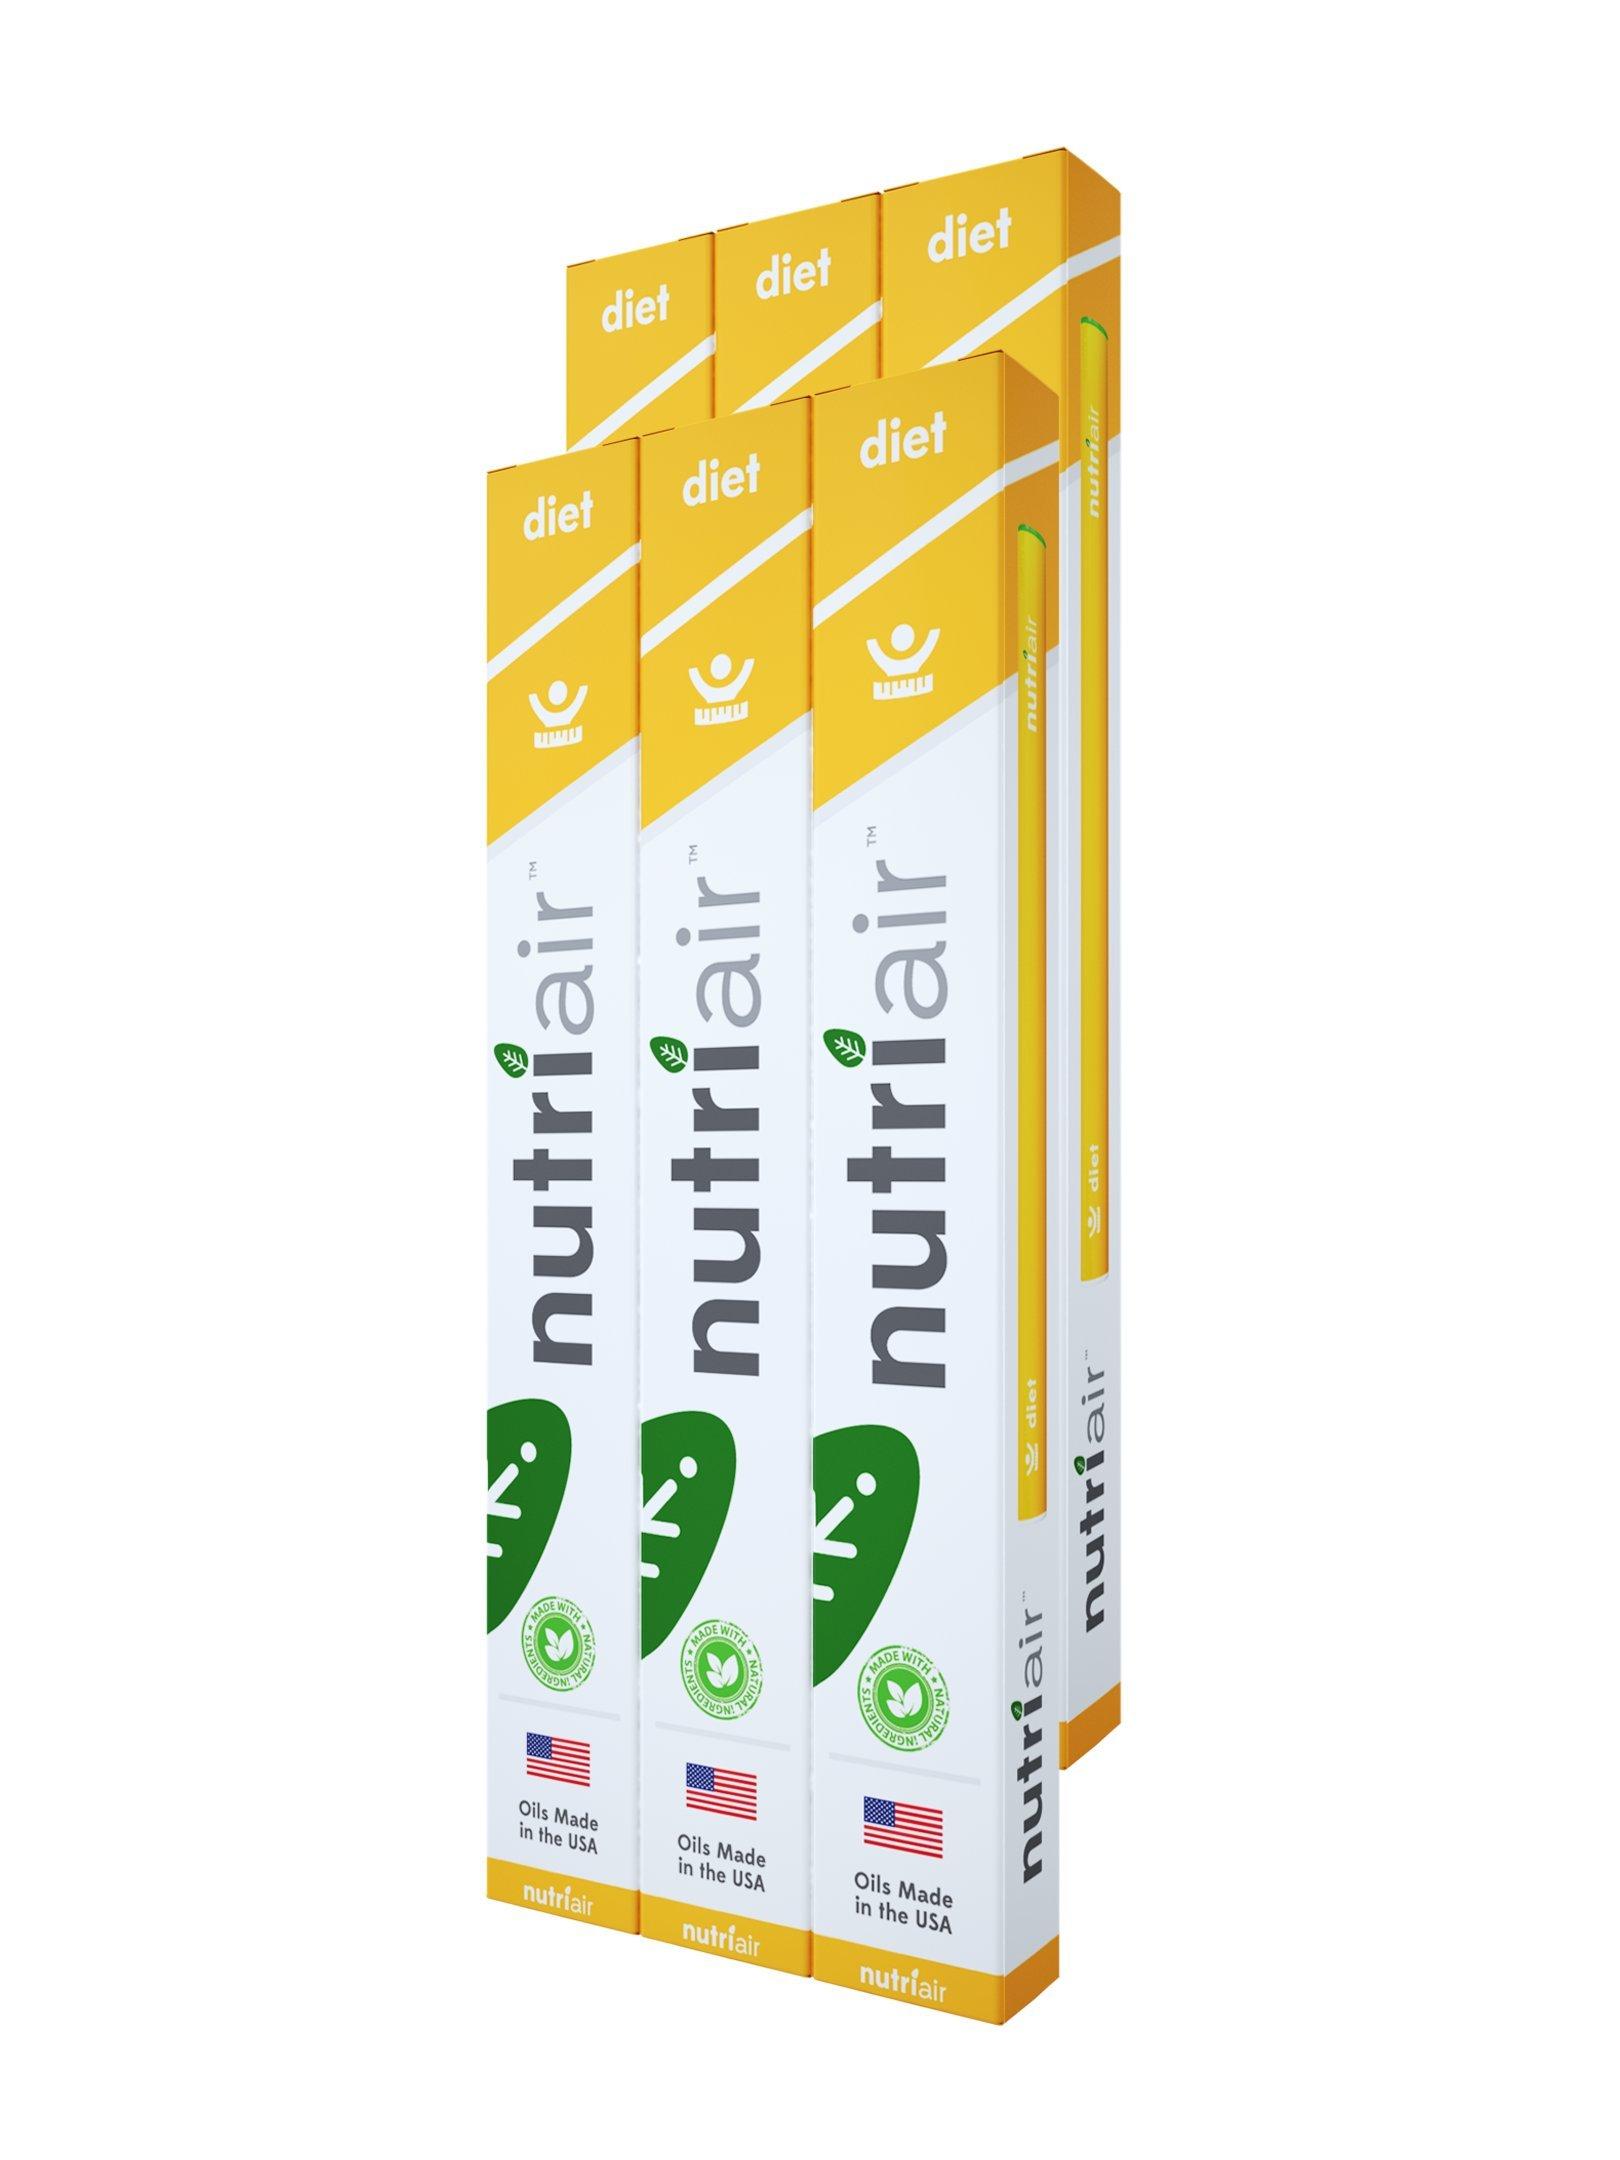 Nutriair Diet - Nutritional Supplement Inhaler - Instant Appetite Suppressant - Block Food Cravings - Control Calorie Intake (6)